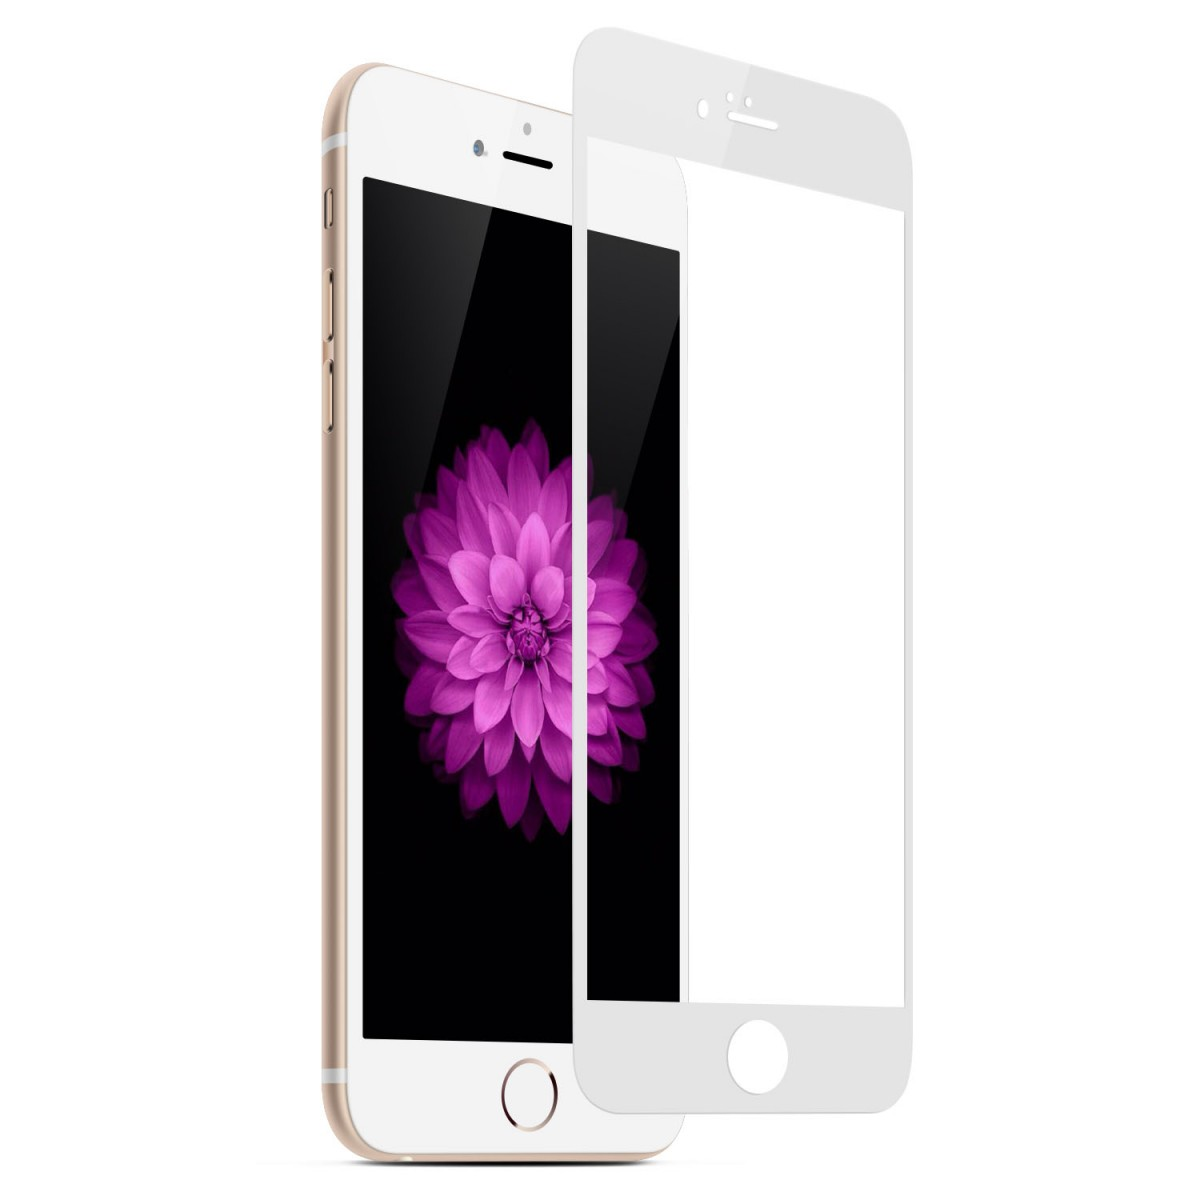 Tvrzené sklo FullCover na iPhone 6s / 6 (bílé)